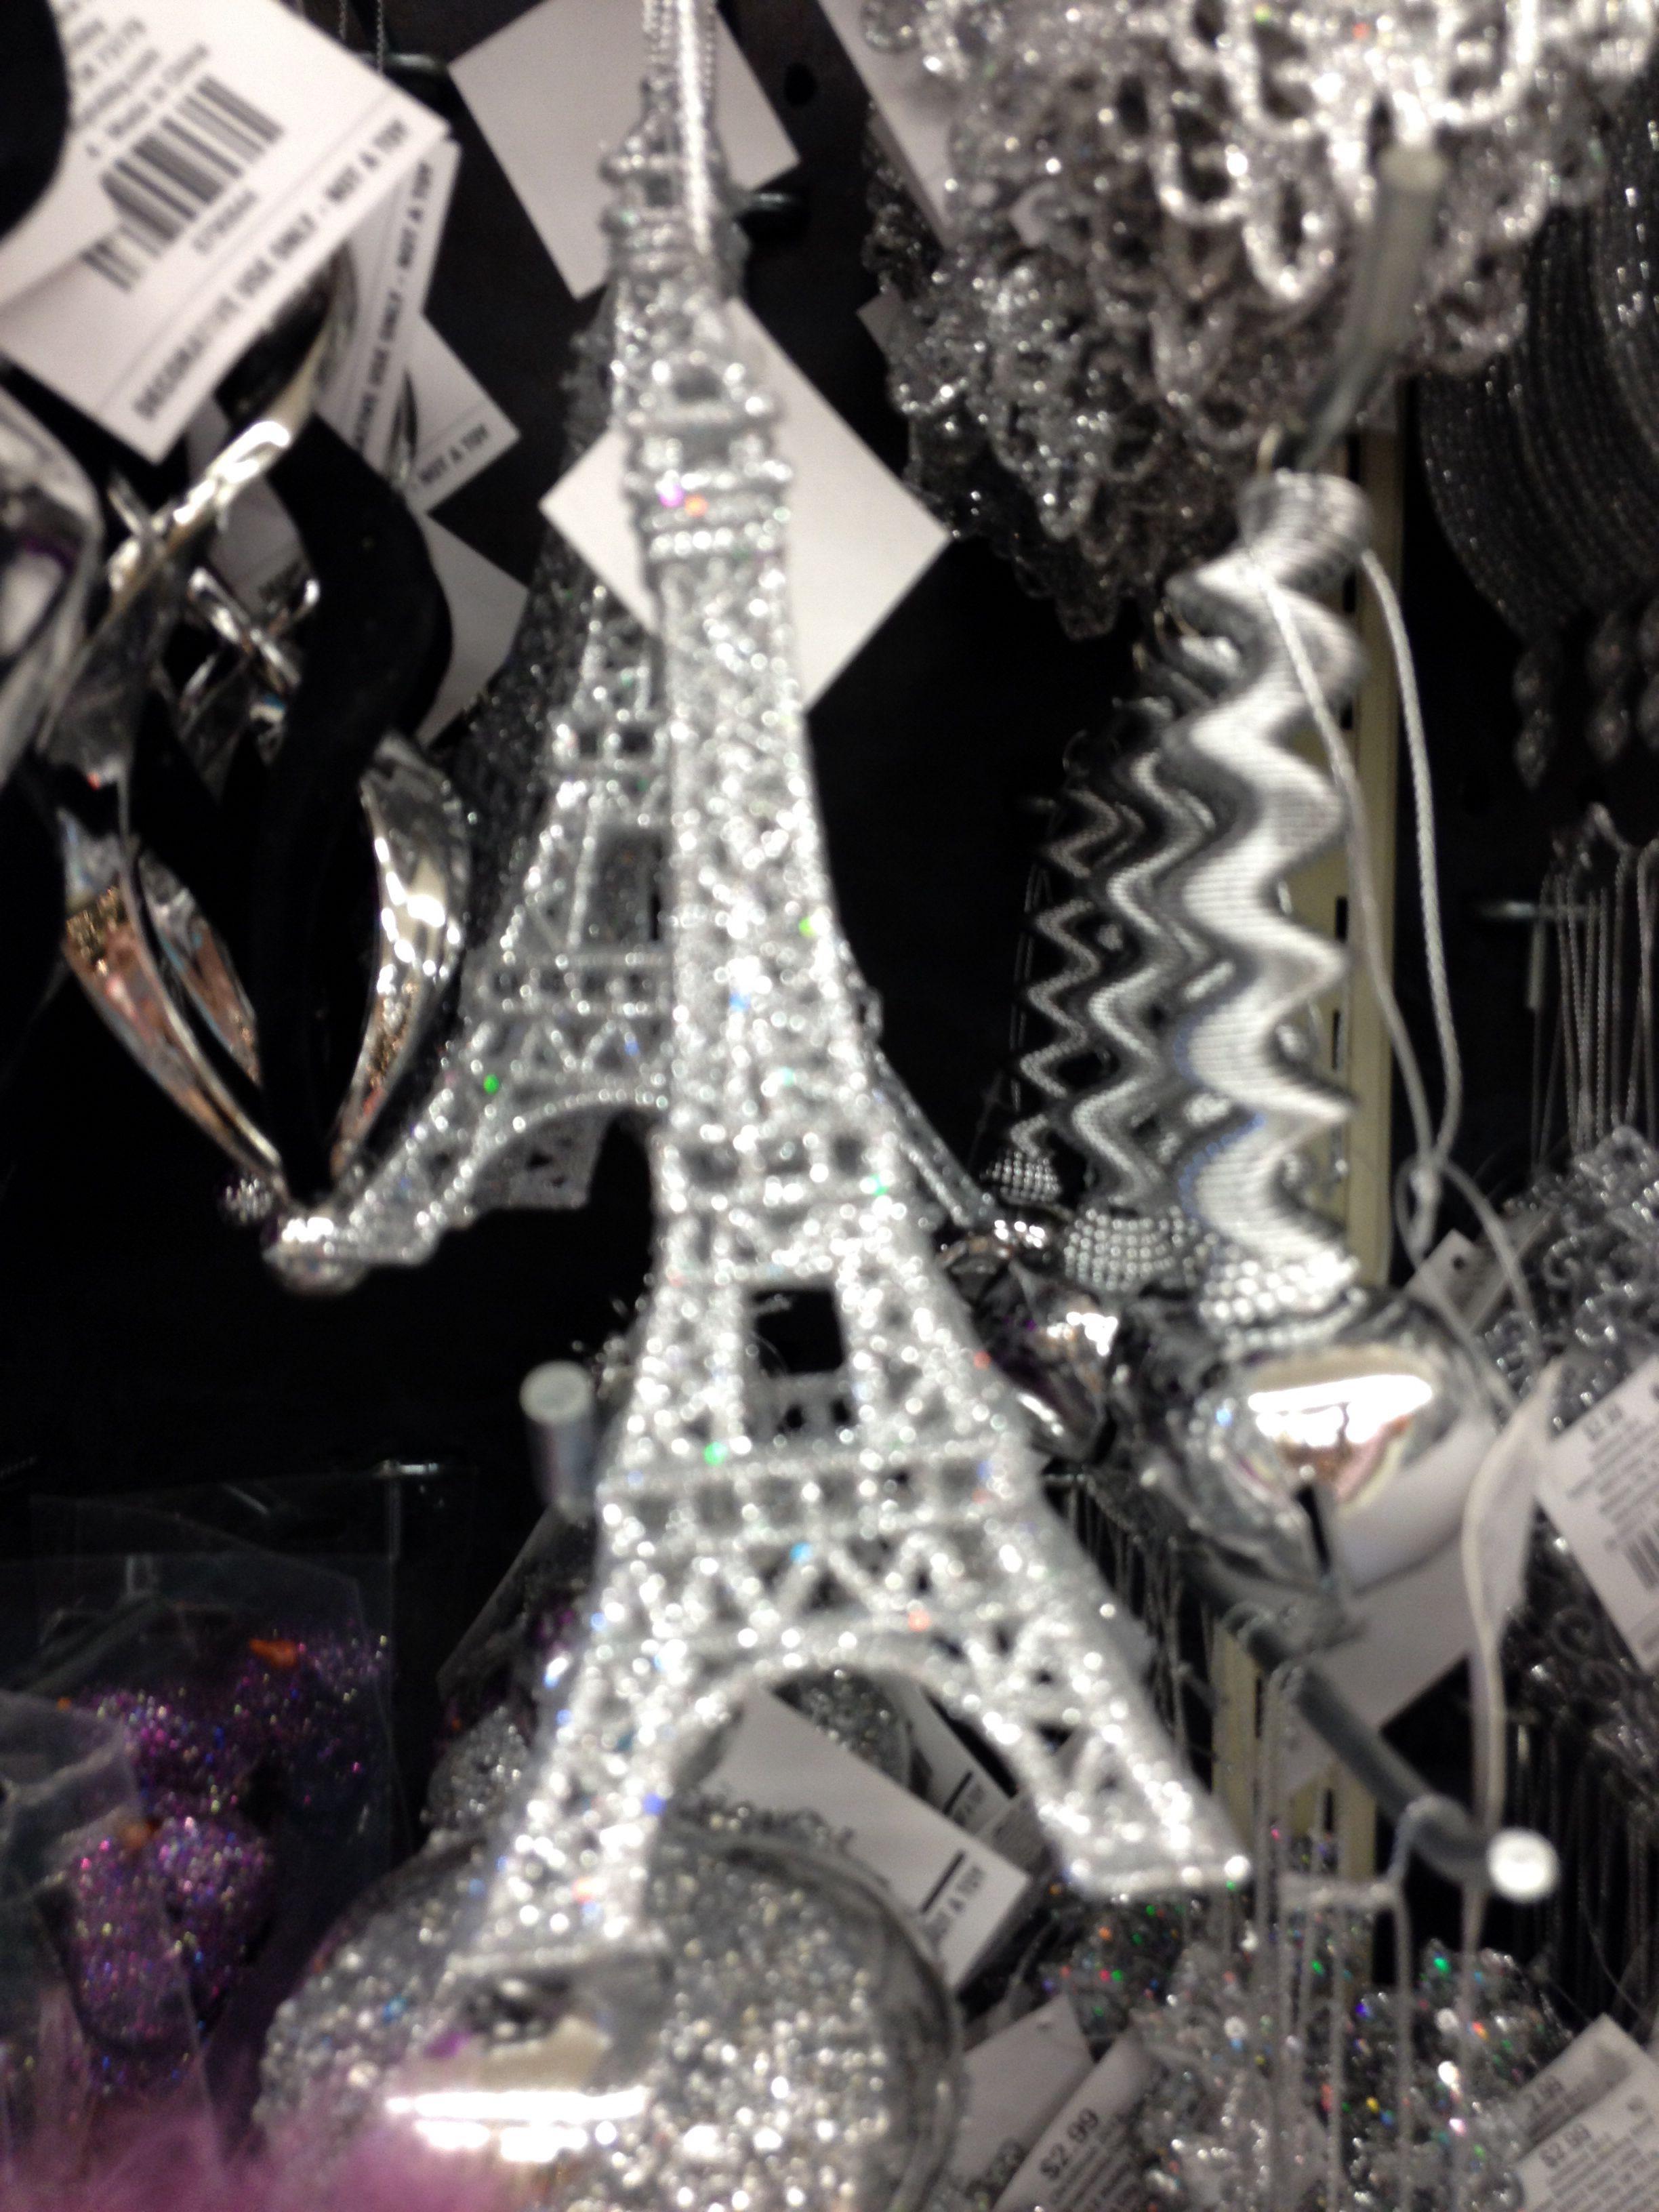 Eiffel Tower ornament at Hobby Lobby | Holiday | Pinterest | Lobbies ...